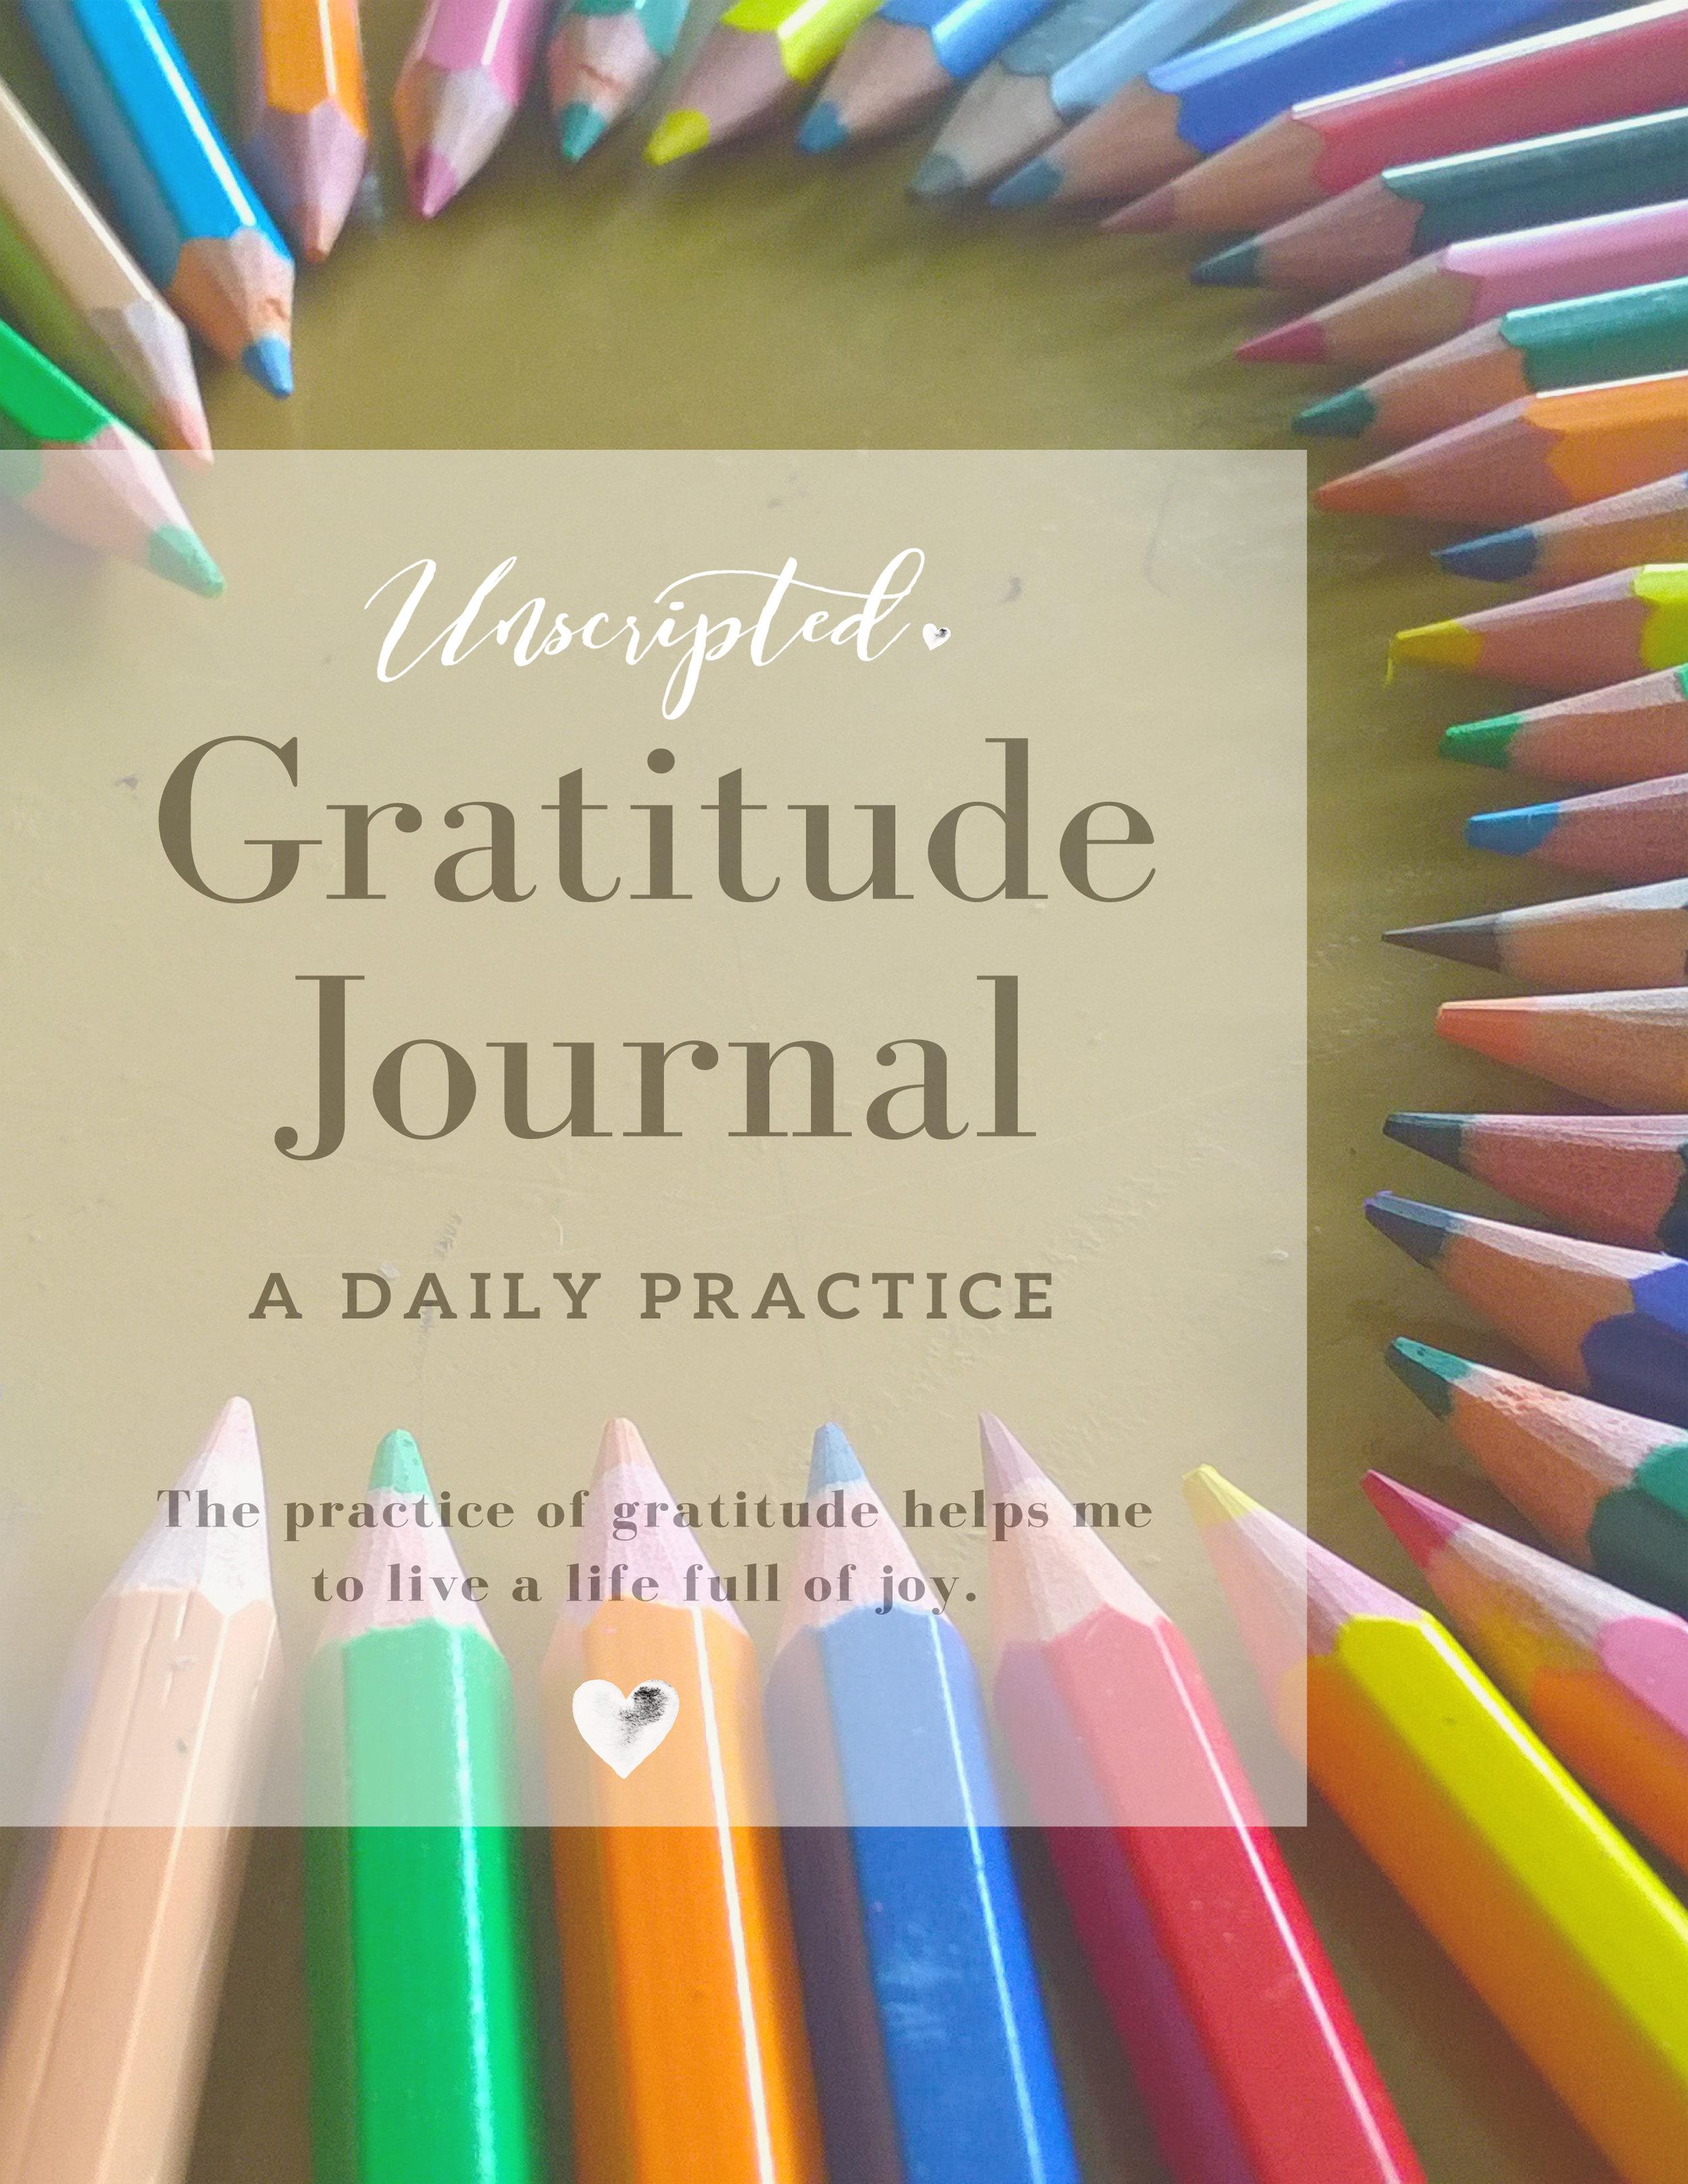 Copy of Gratitude Journal_edited-1 copy.jpg